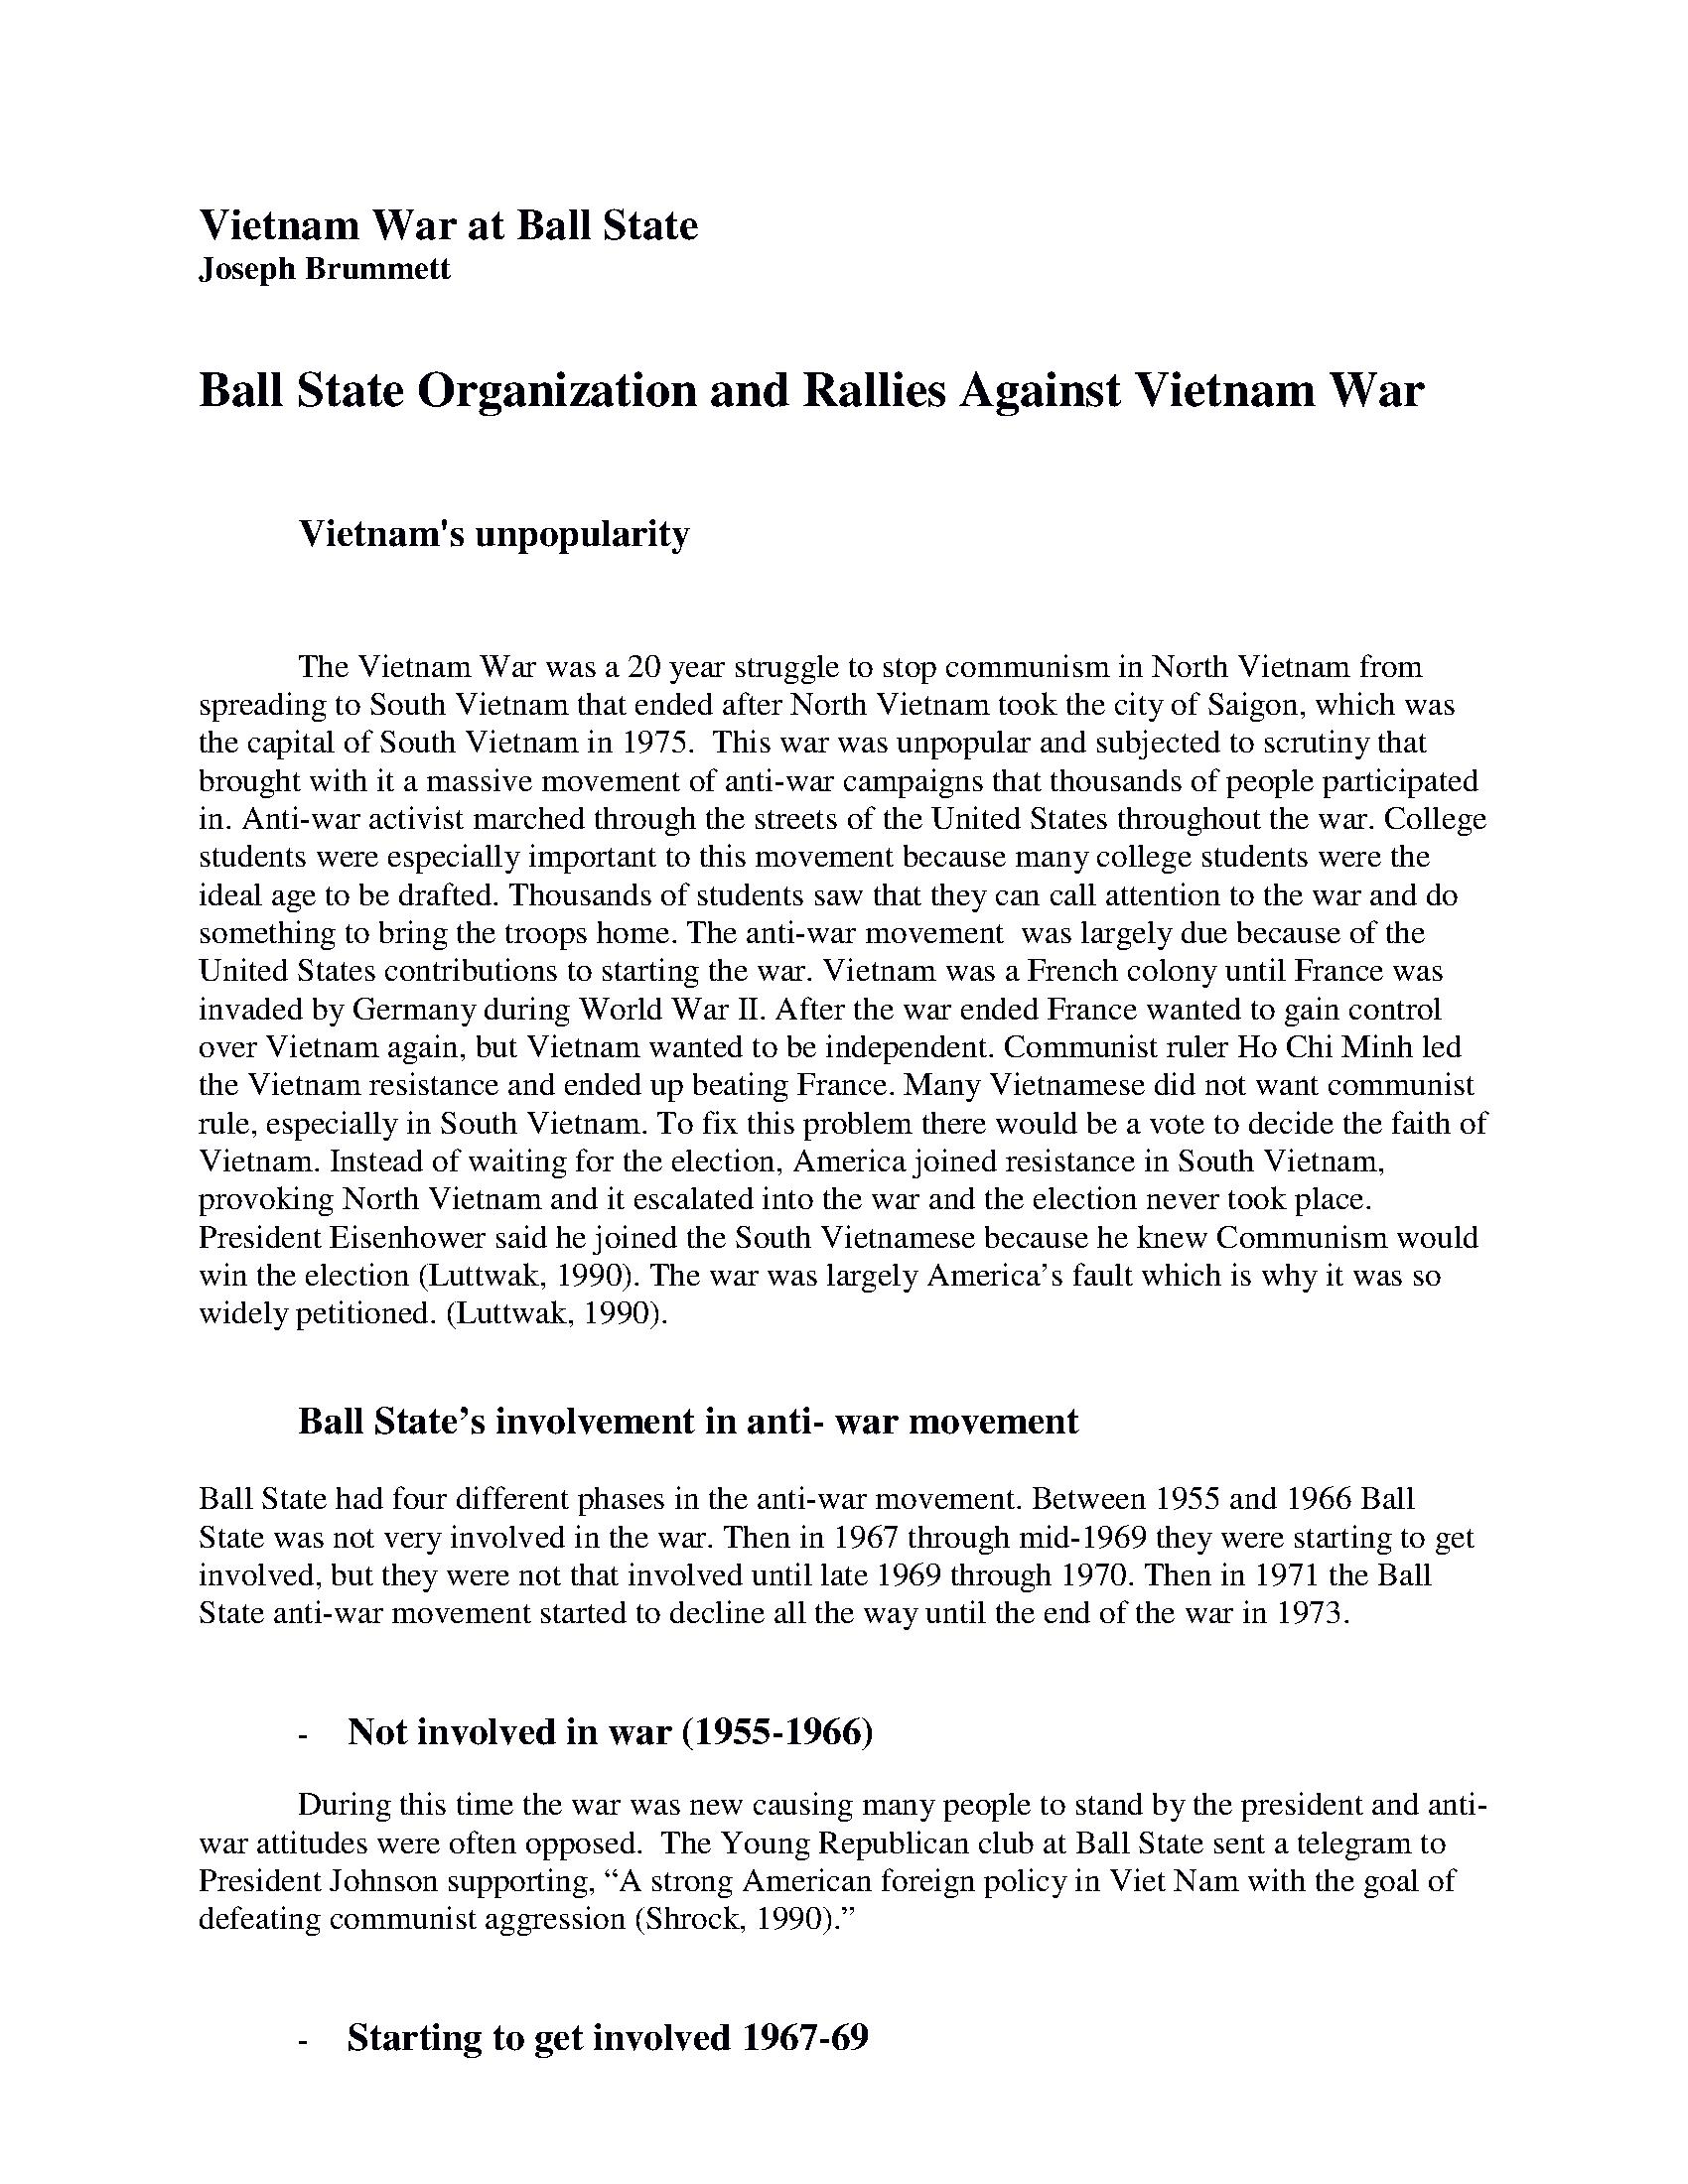 Narrative - Ball State Digital History Portal - Ball State